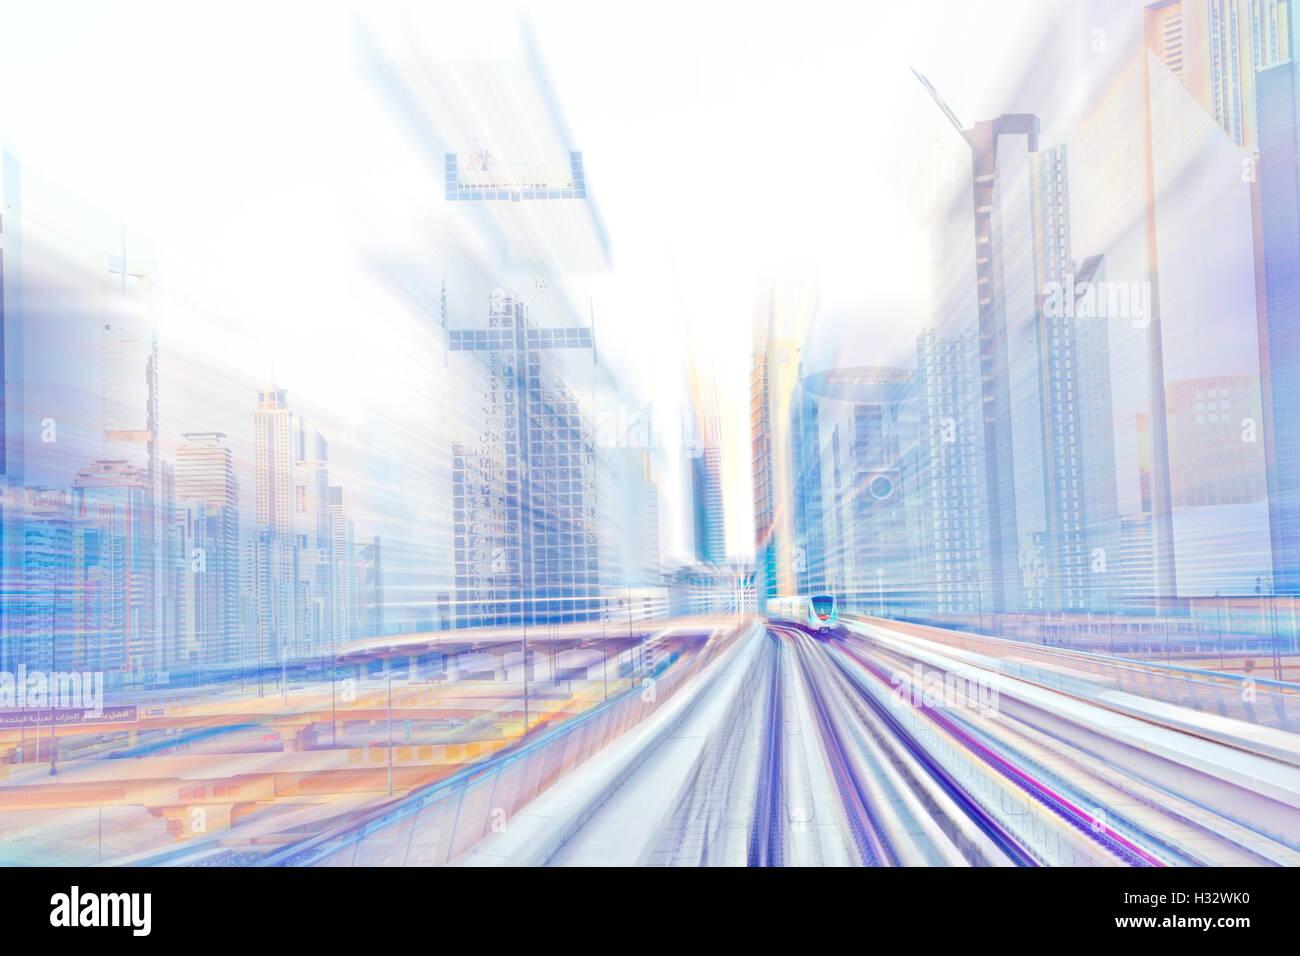 Metro train abstract - Stock Image